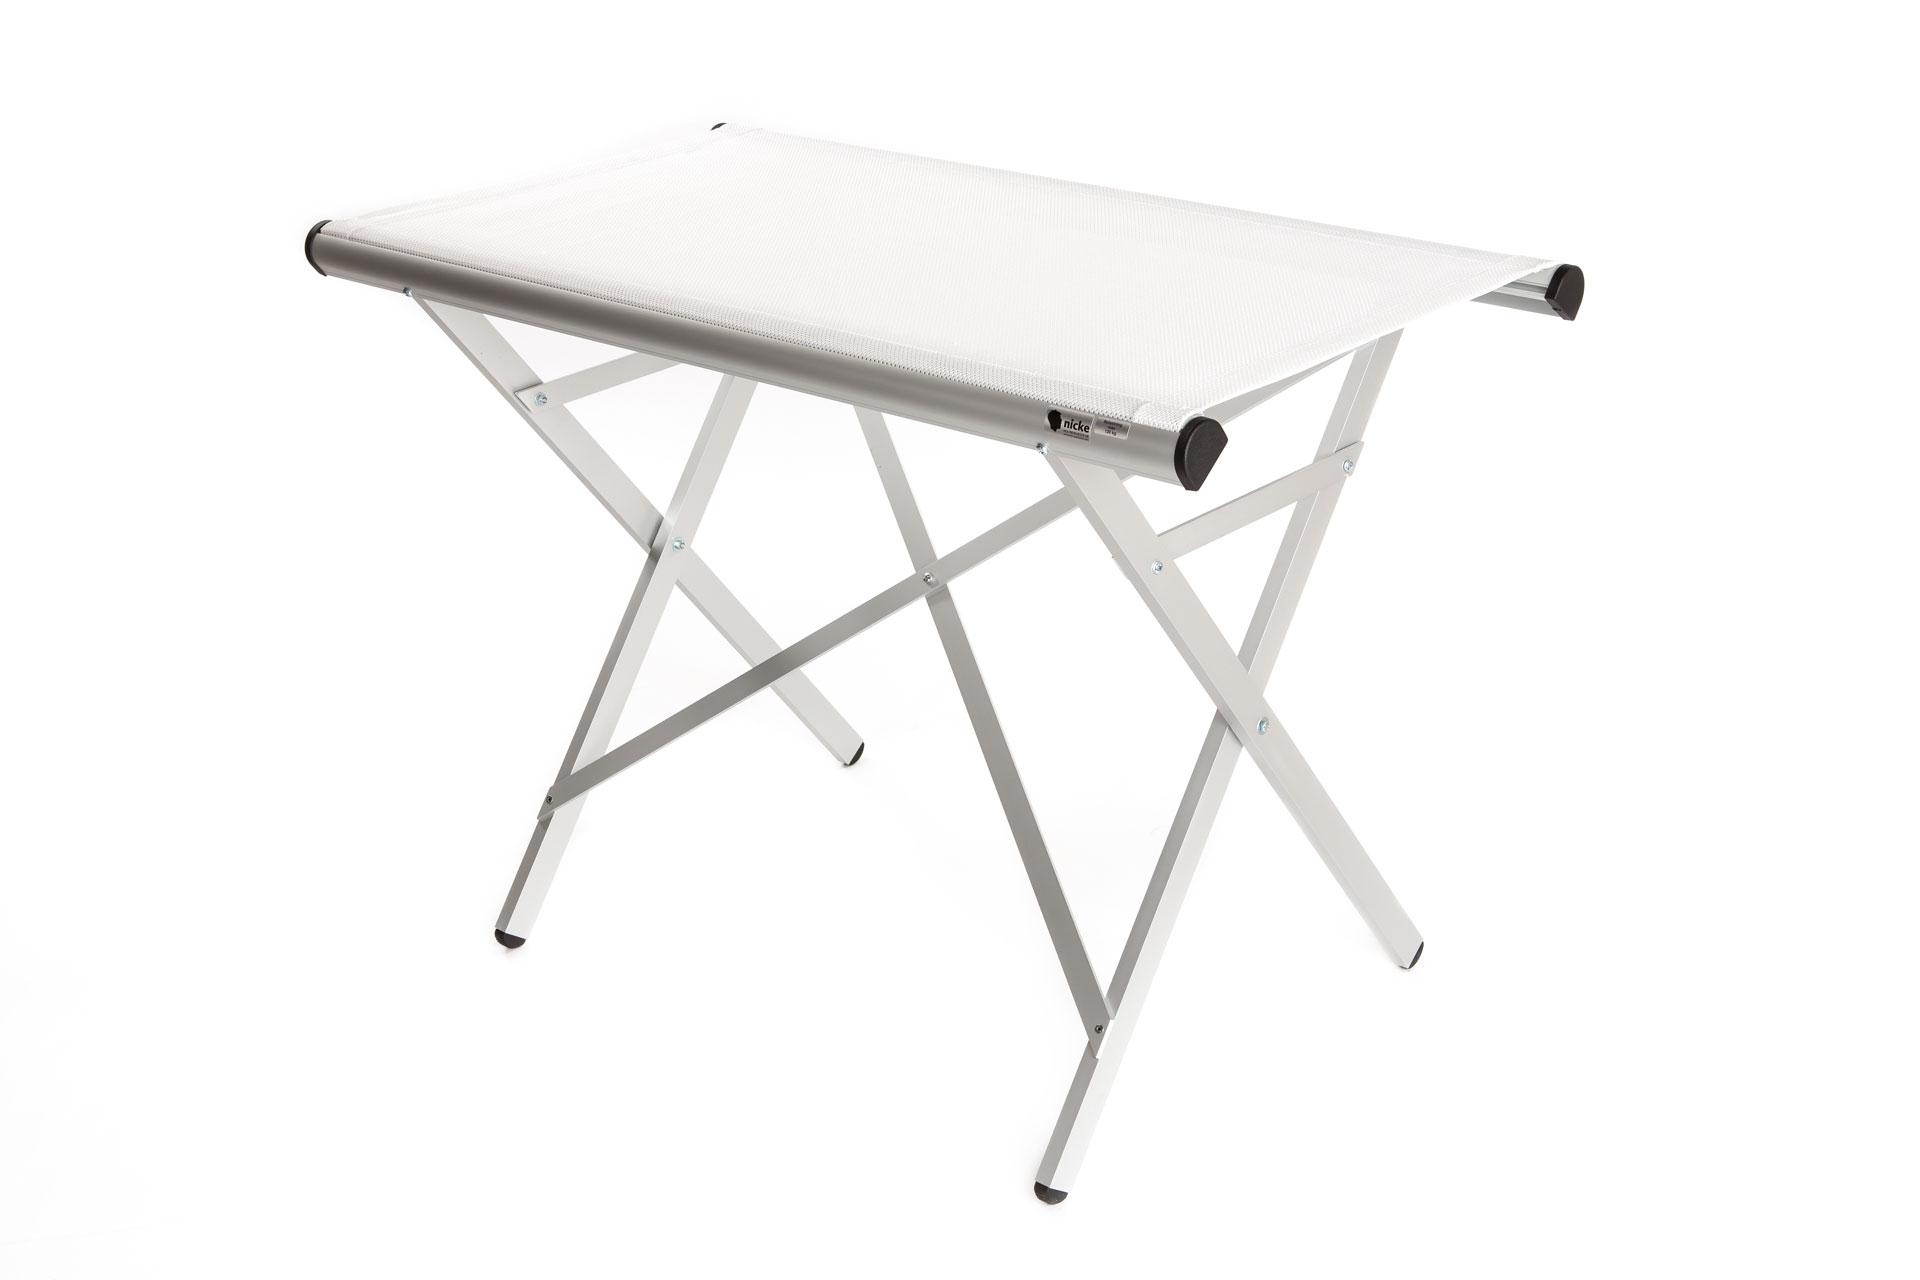 Fristående Skötbord Med Vit Duk